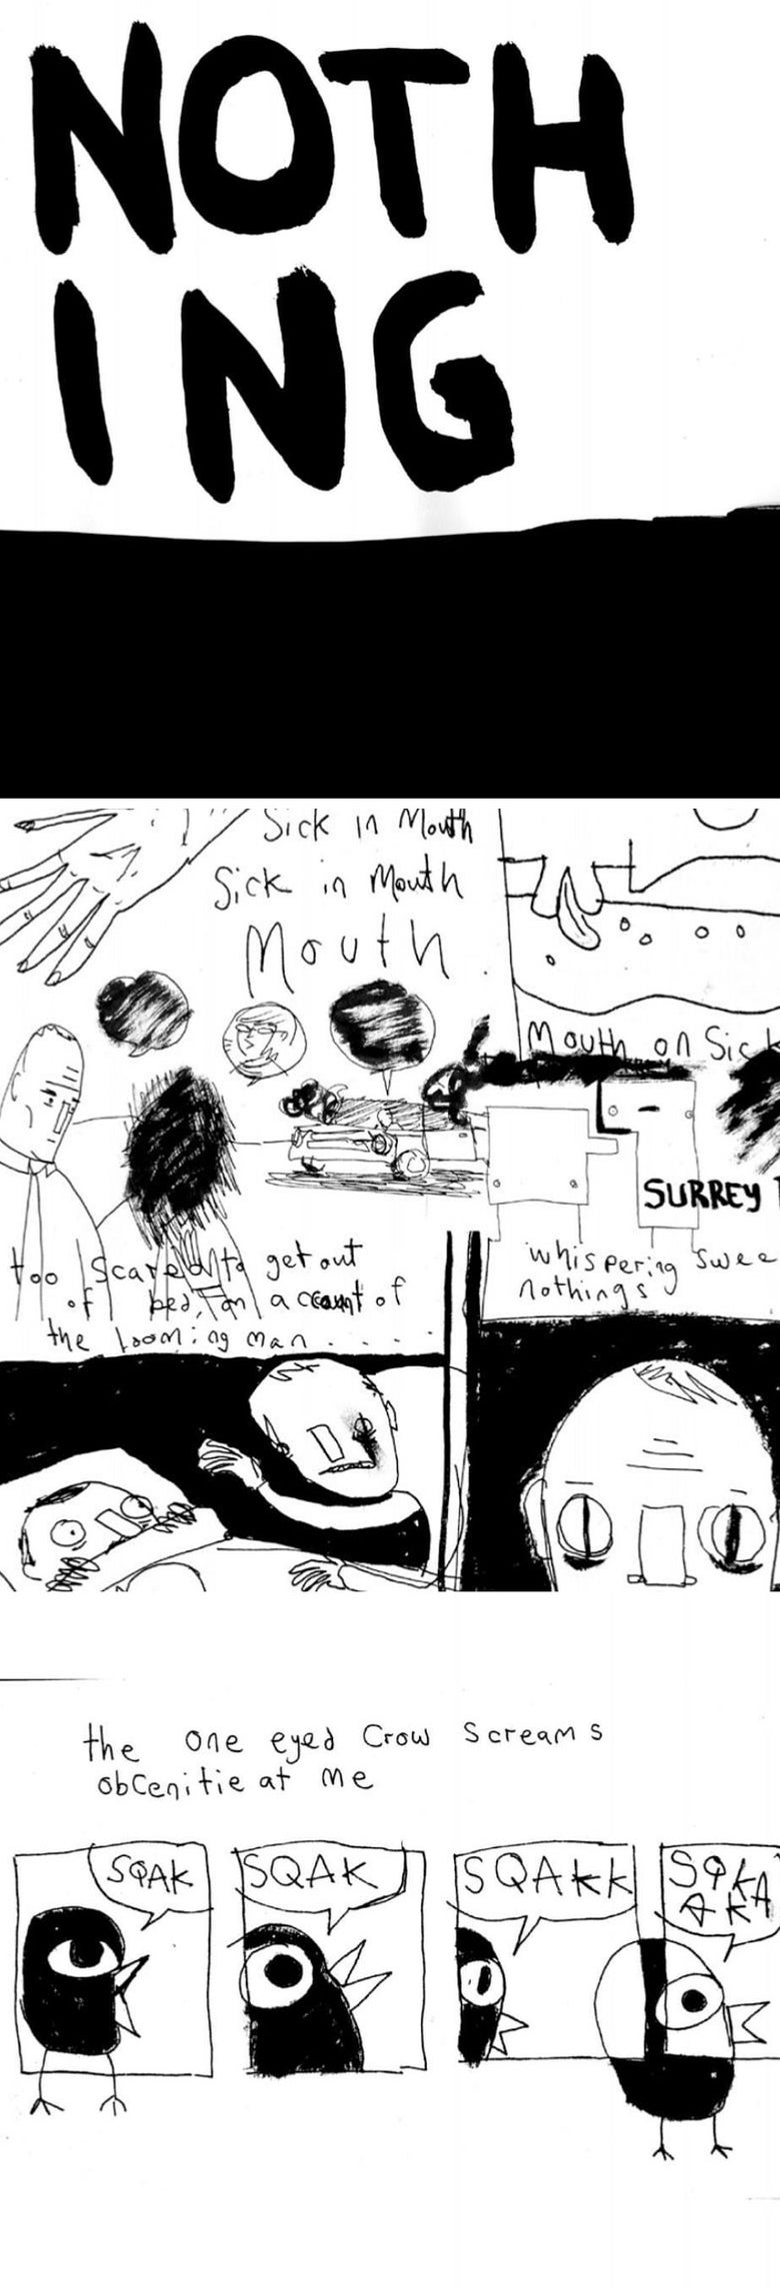 Image of Nothing - Comic